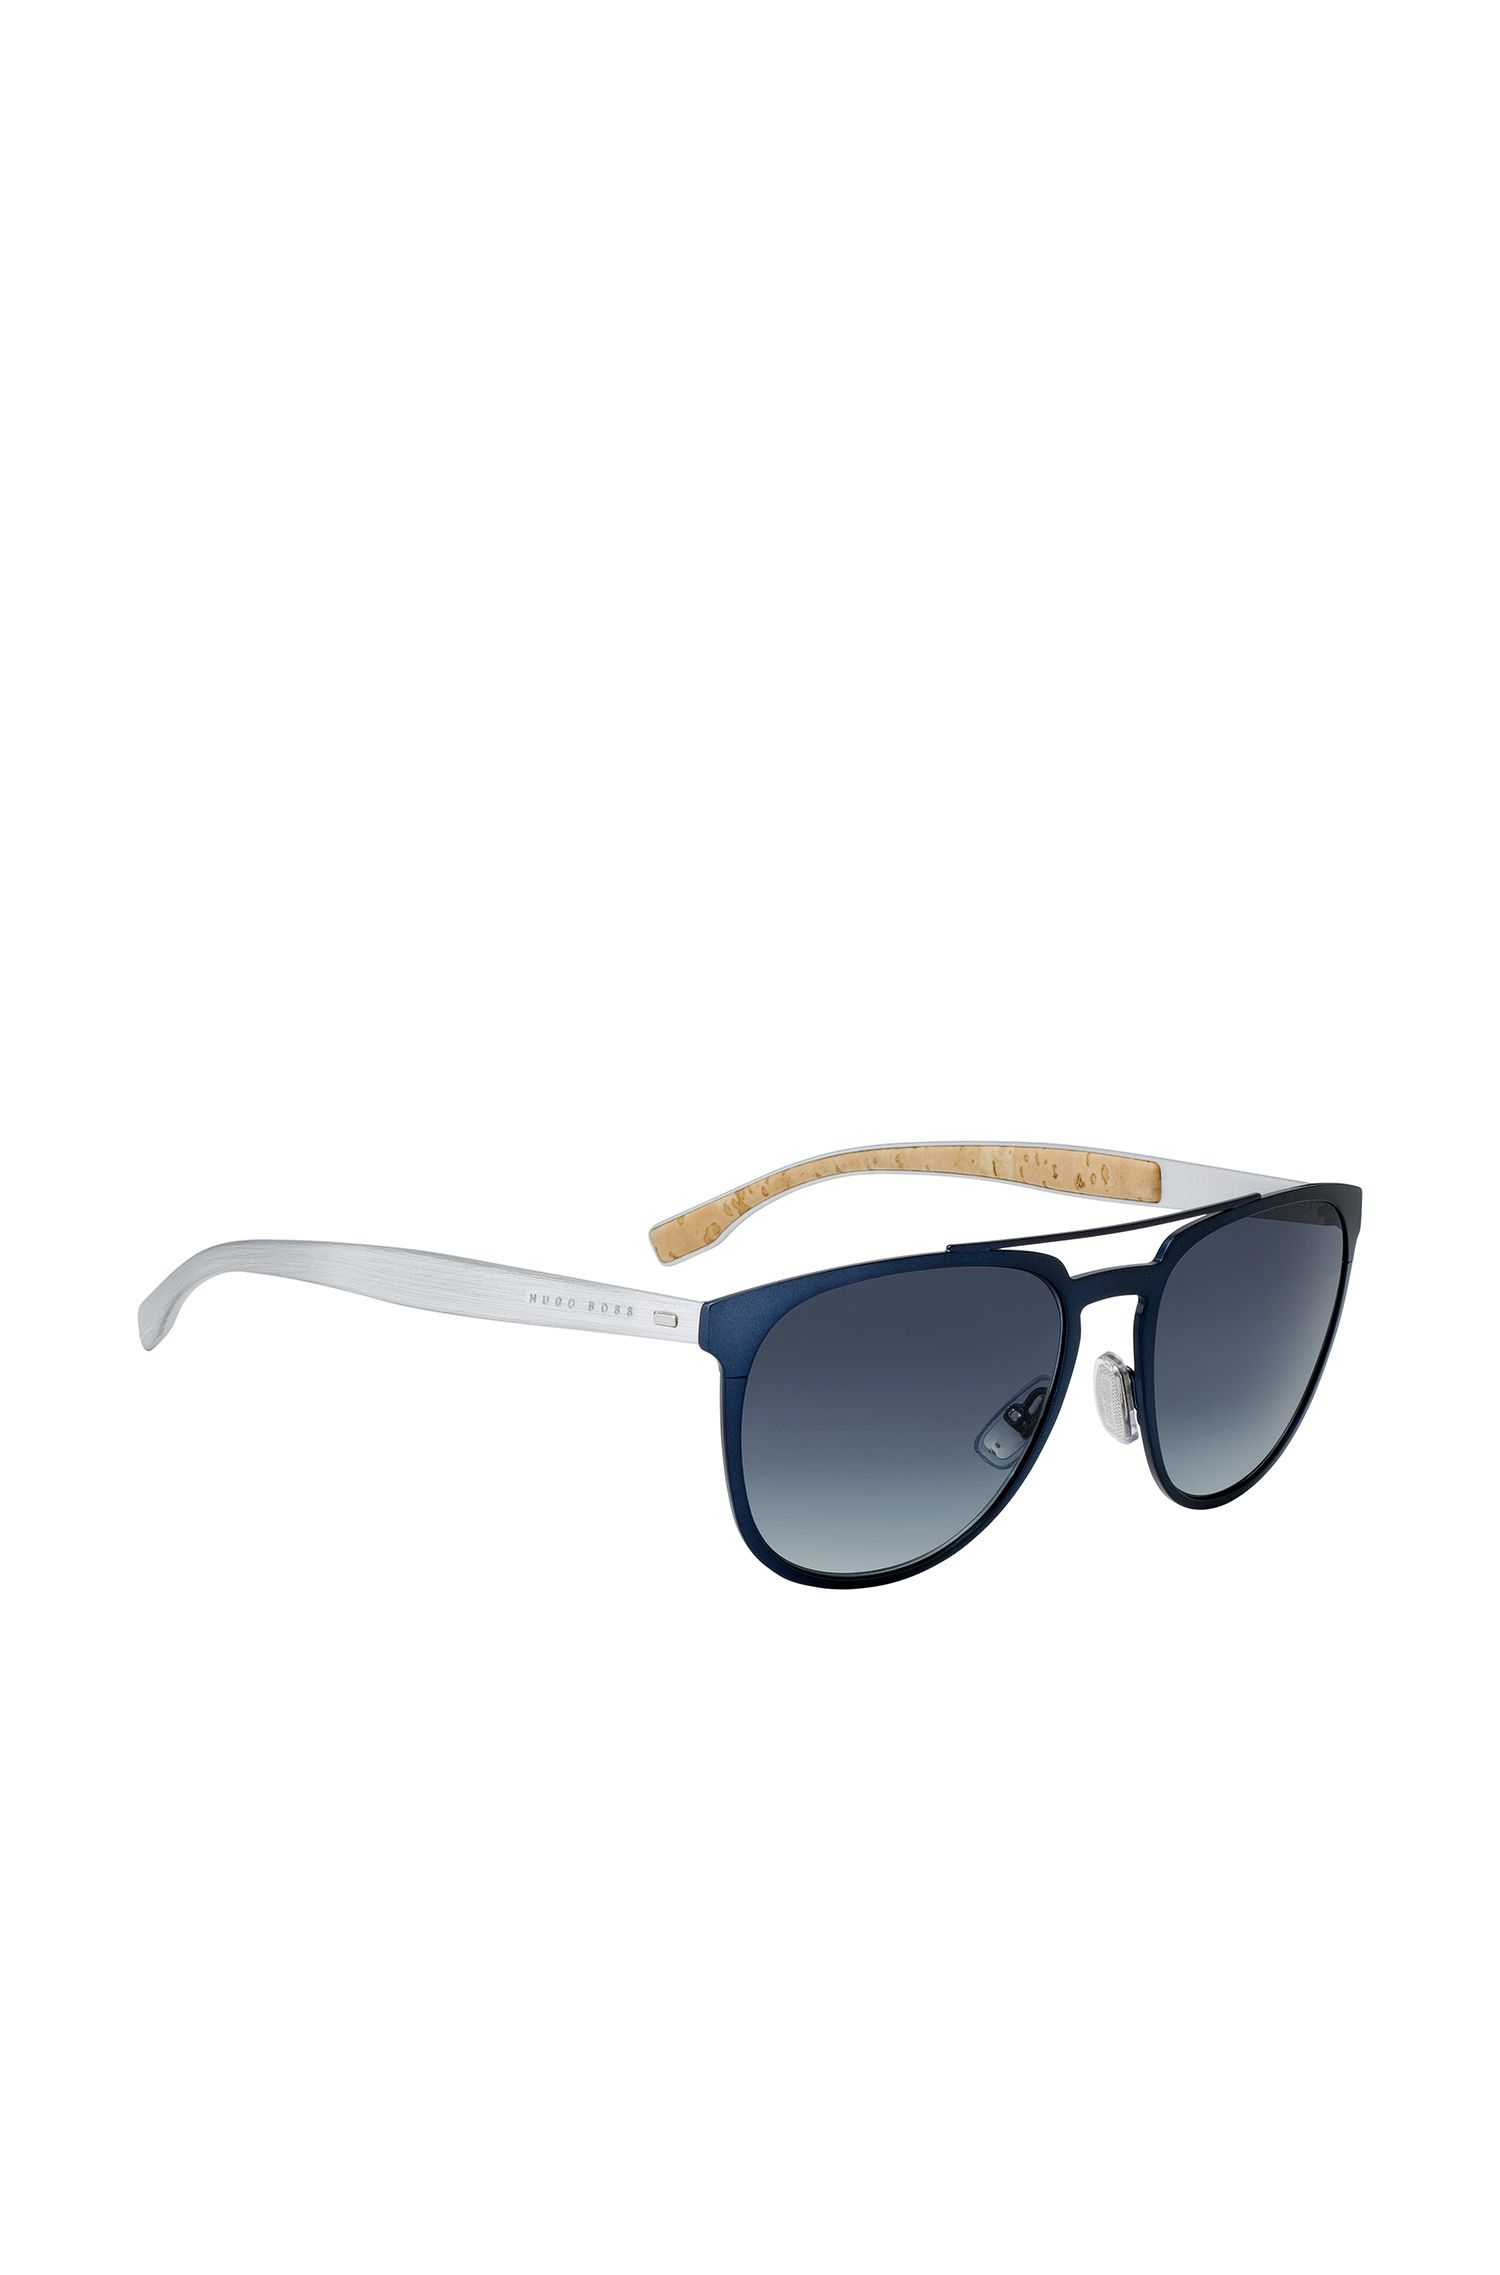 'BOSS 0882S'   Dark Grey Gradient Round Metal Sunglasses